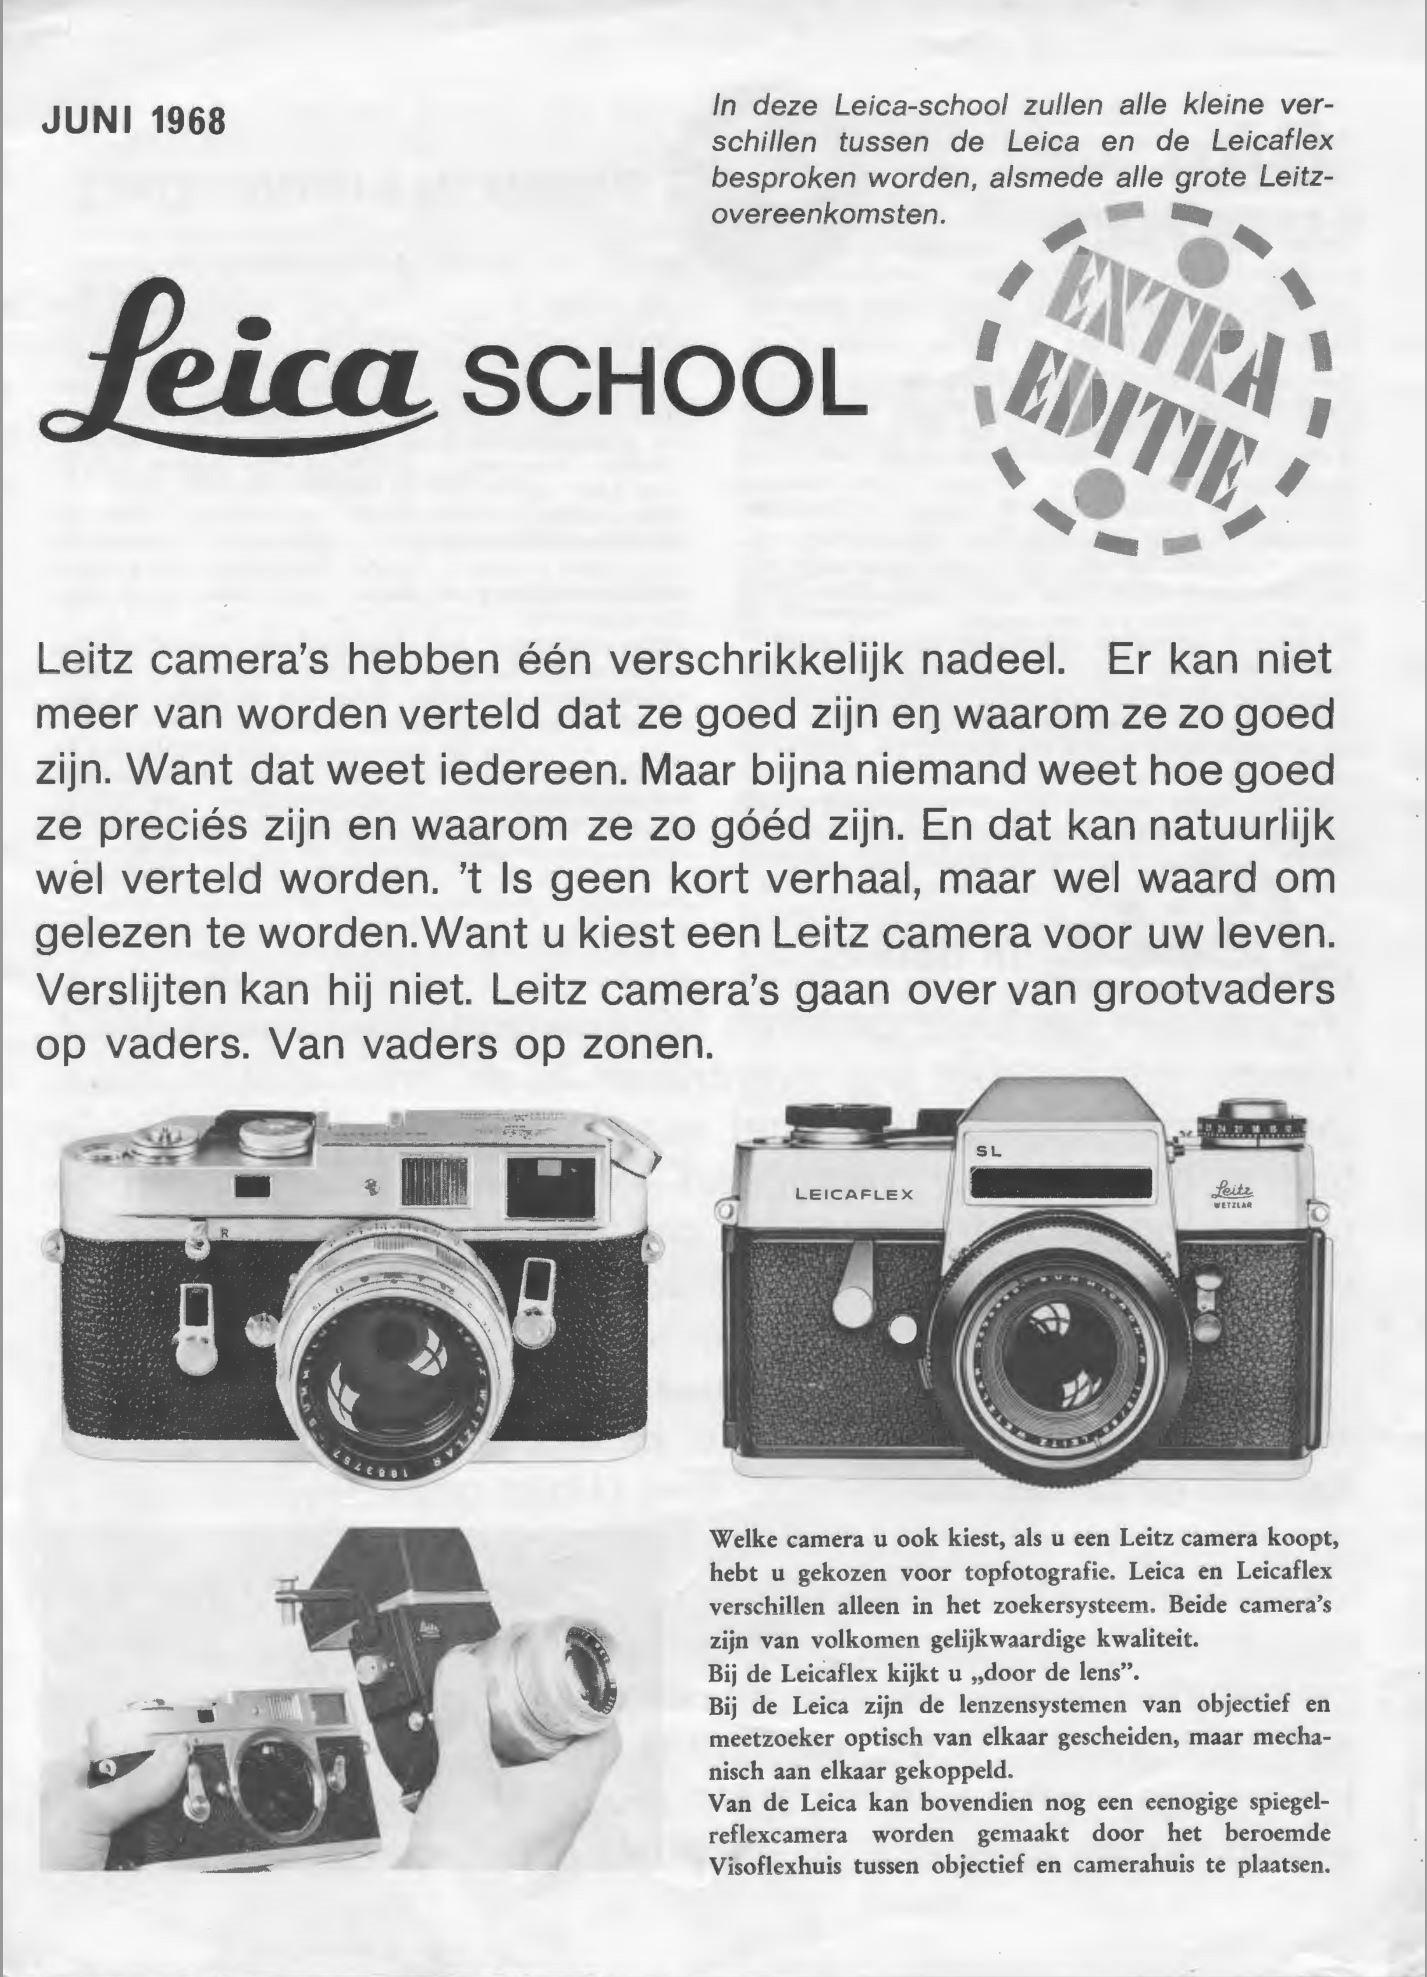 Leicaschoolmkoptics